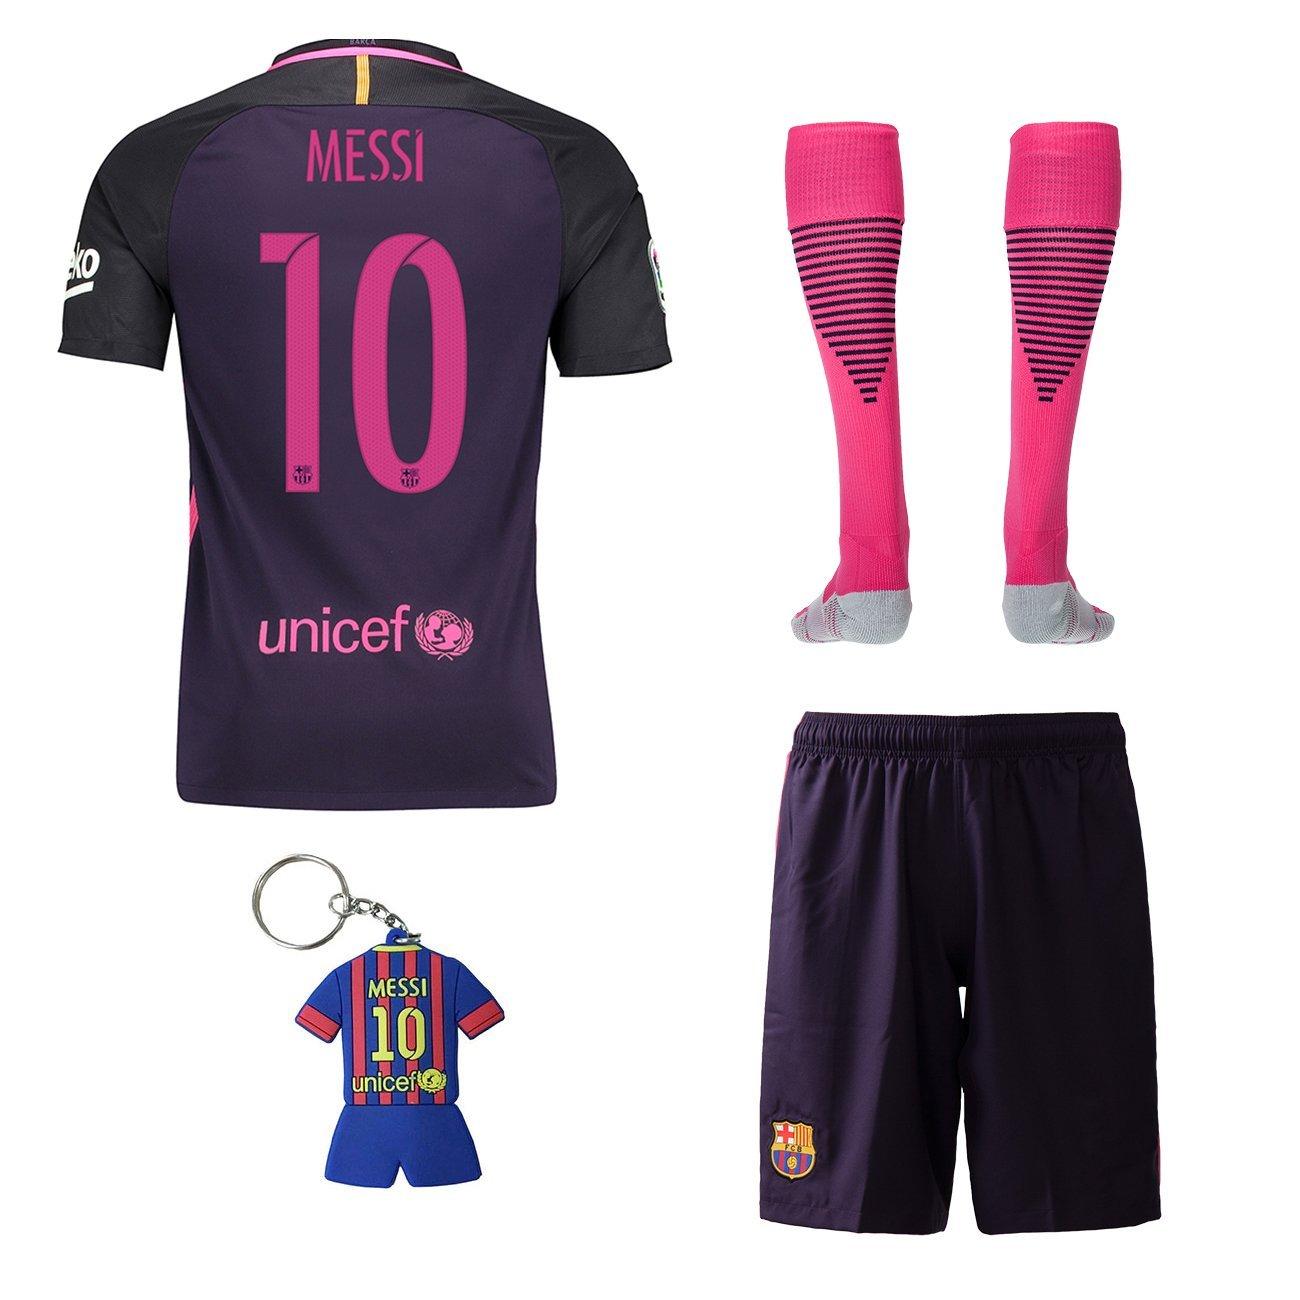 Buy 2016 2017 Barcelona Away  10 Messi Kids Soccer Wear Shorts Socks ... baf08897a